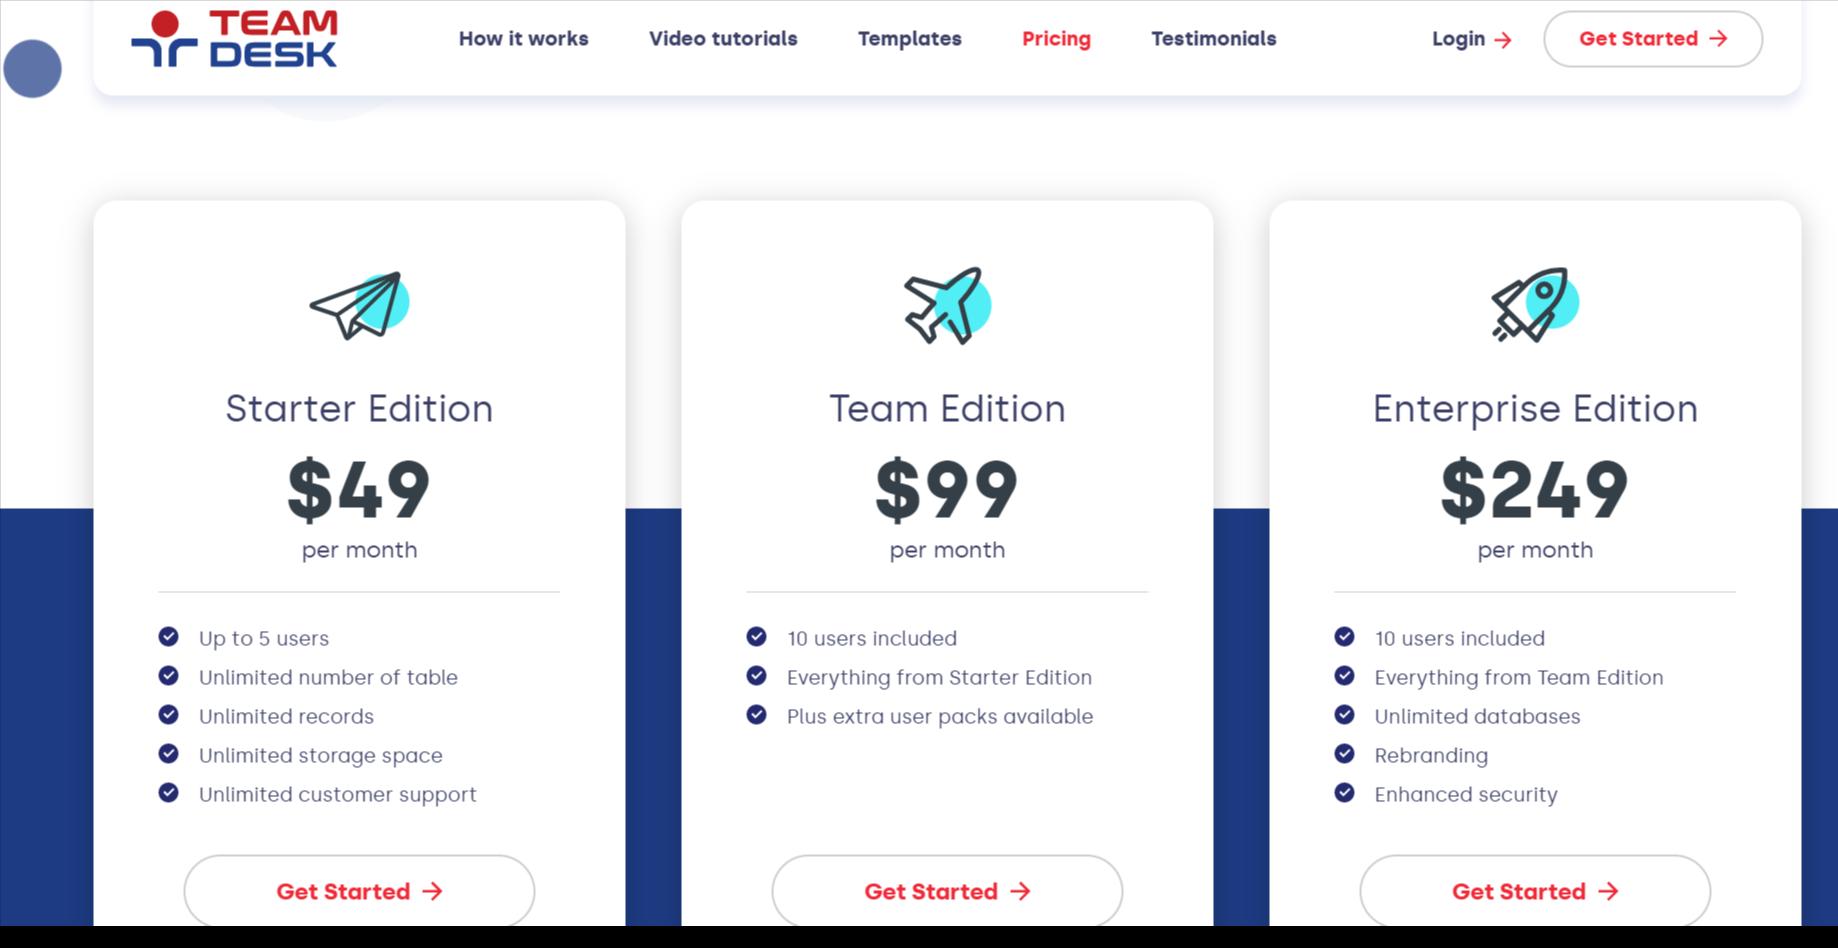 TeamDesk Pricing